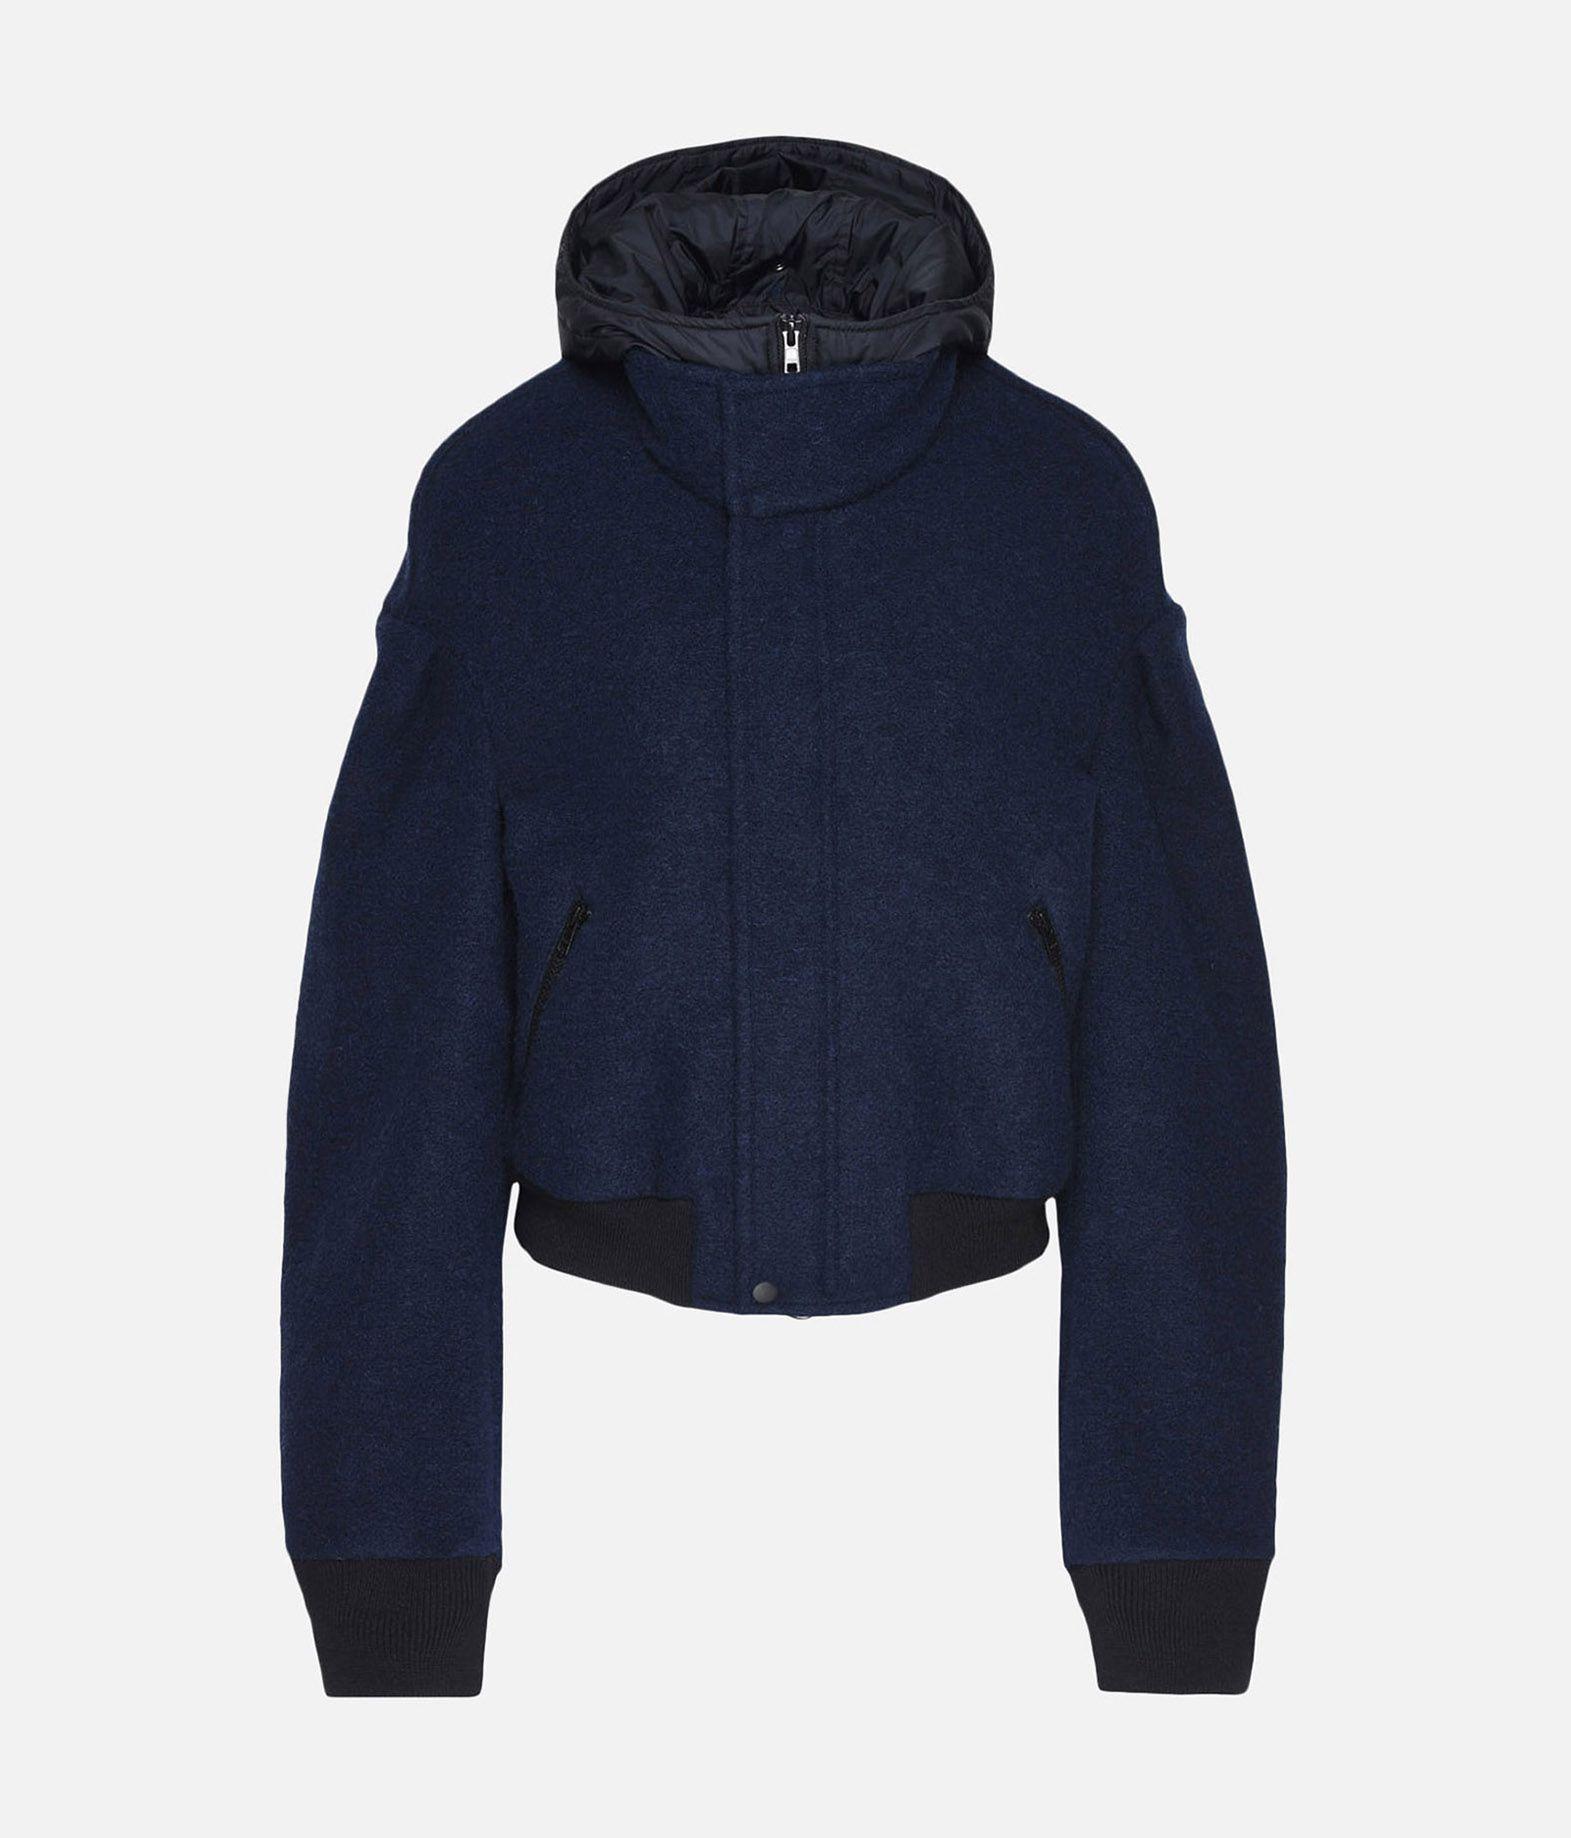 Y-3 Y-3 Wool Hoodie Jacket Giubbotto Donna f